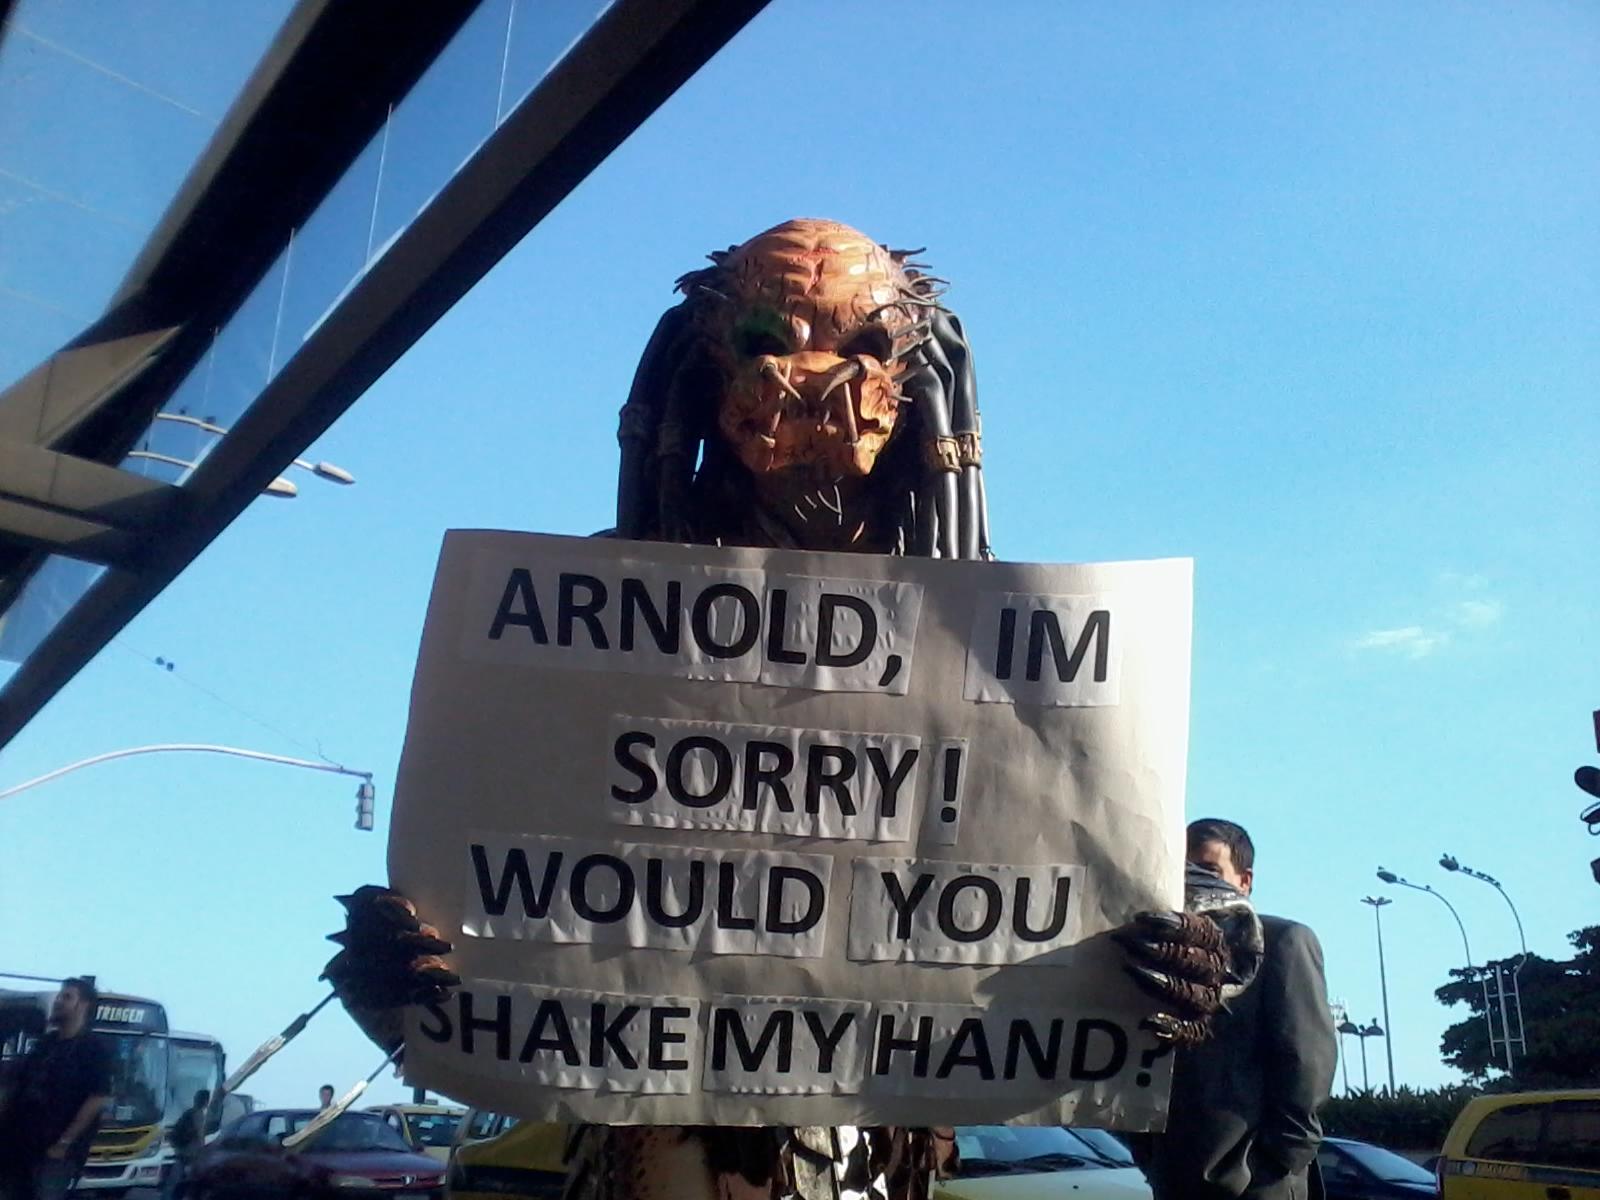 Predador se apresenta para pedir desculpas pessoalmente a Schwarzenegger. Foto: Carlos Arthur Jr./GRACIEMAG